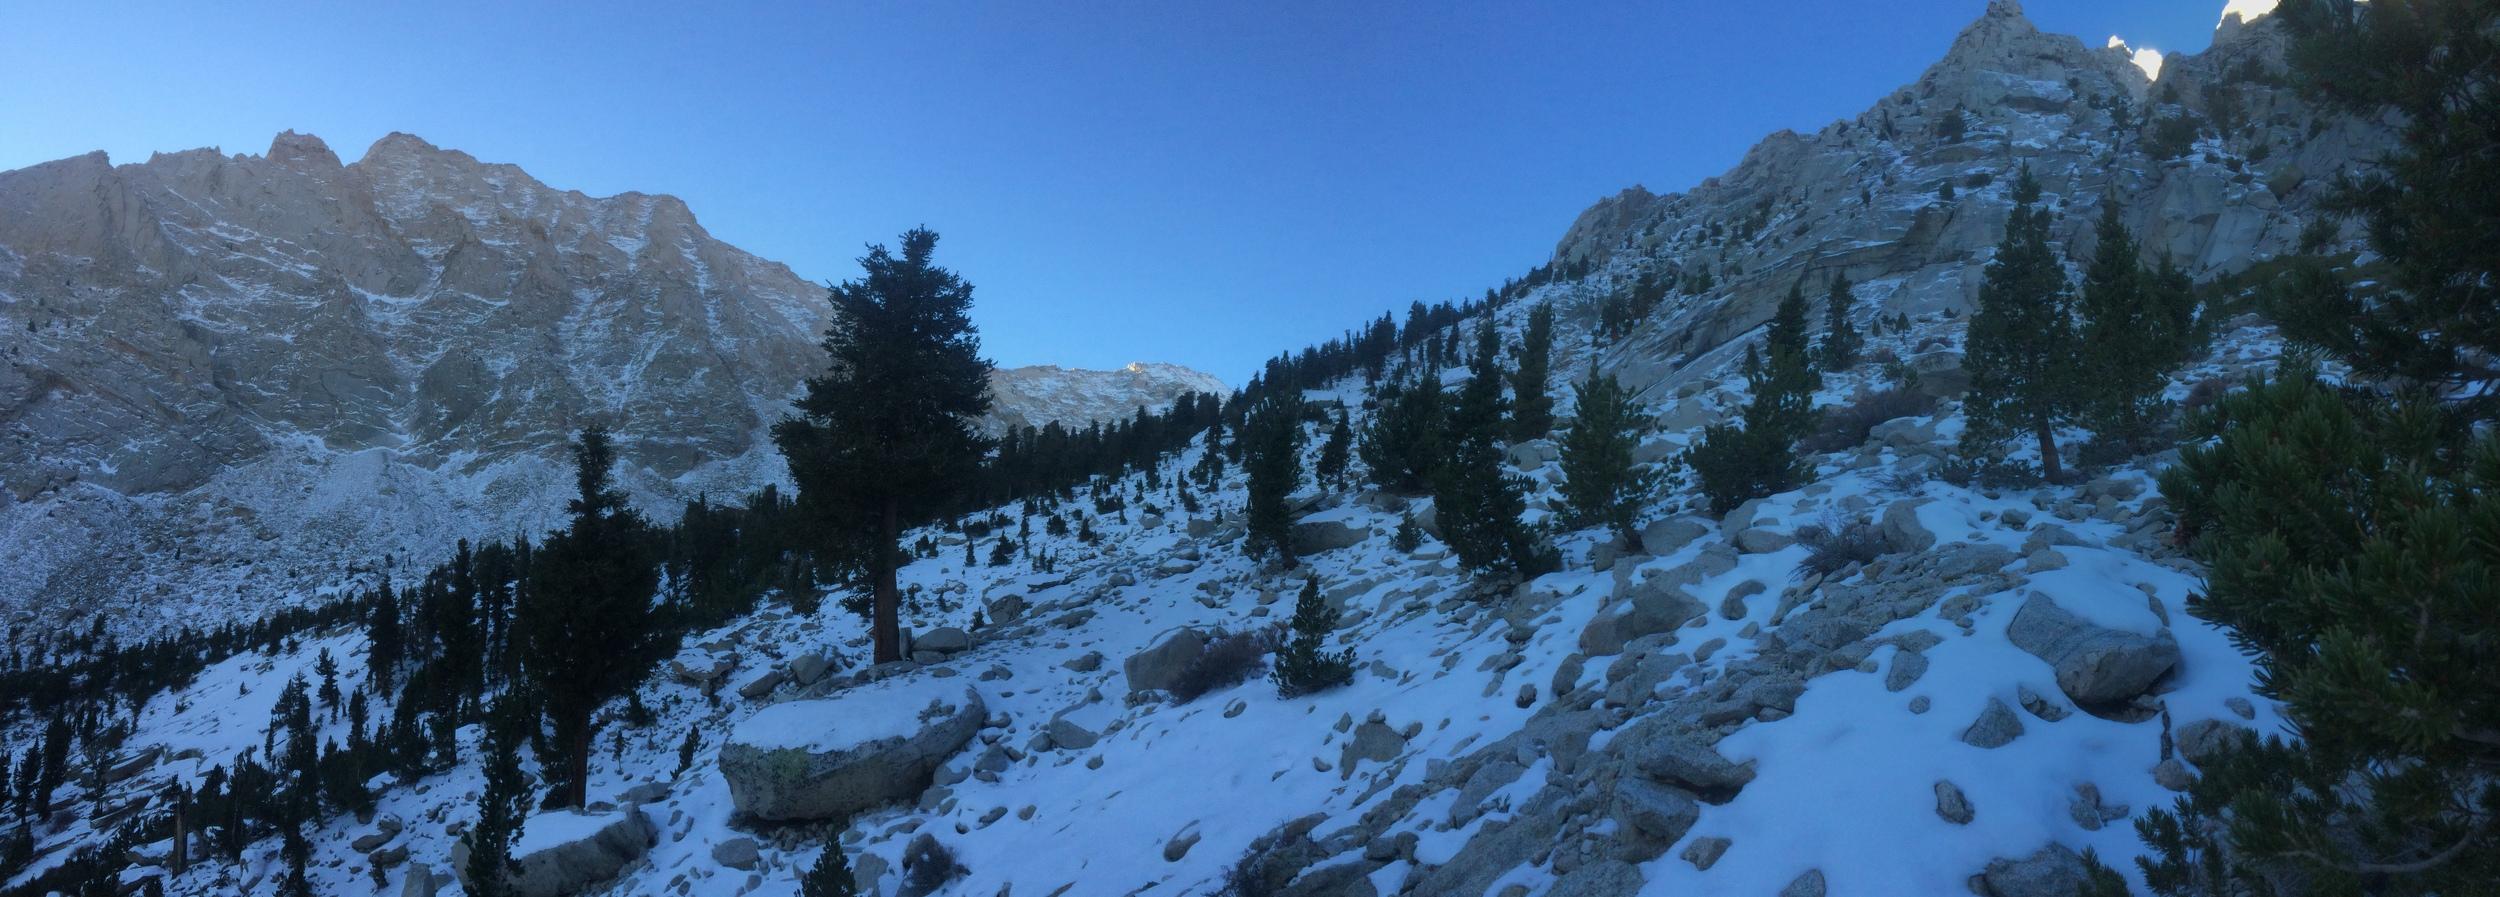 Meysan Lakes Trail, November 13,2015